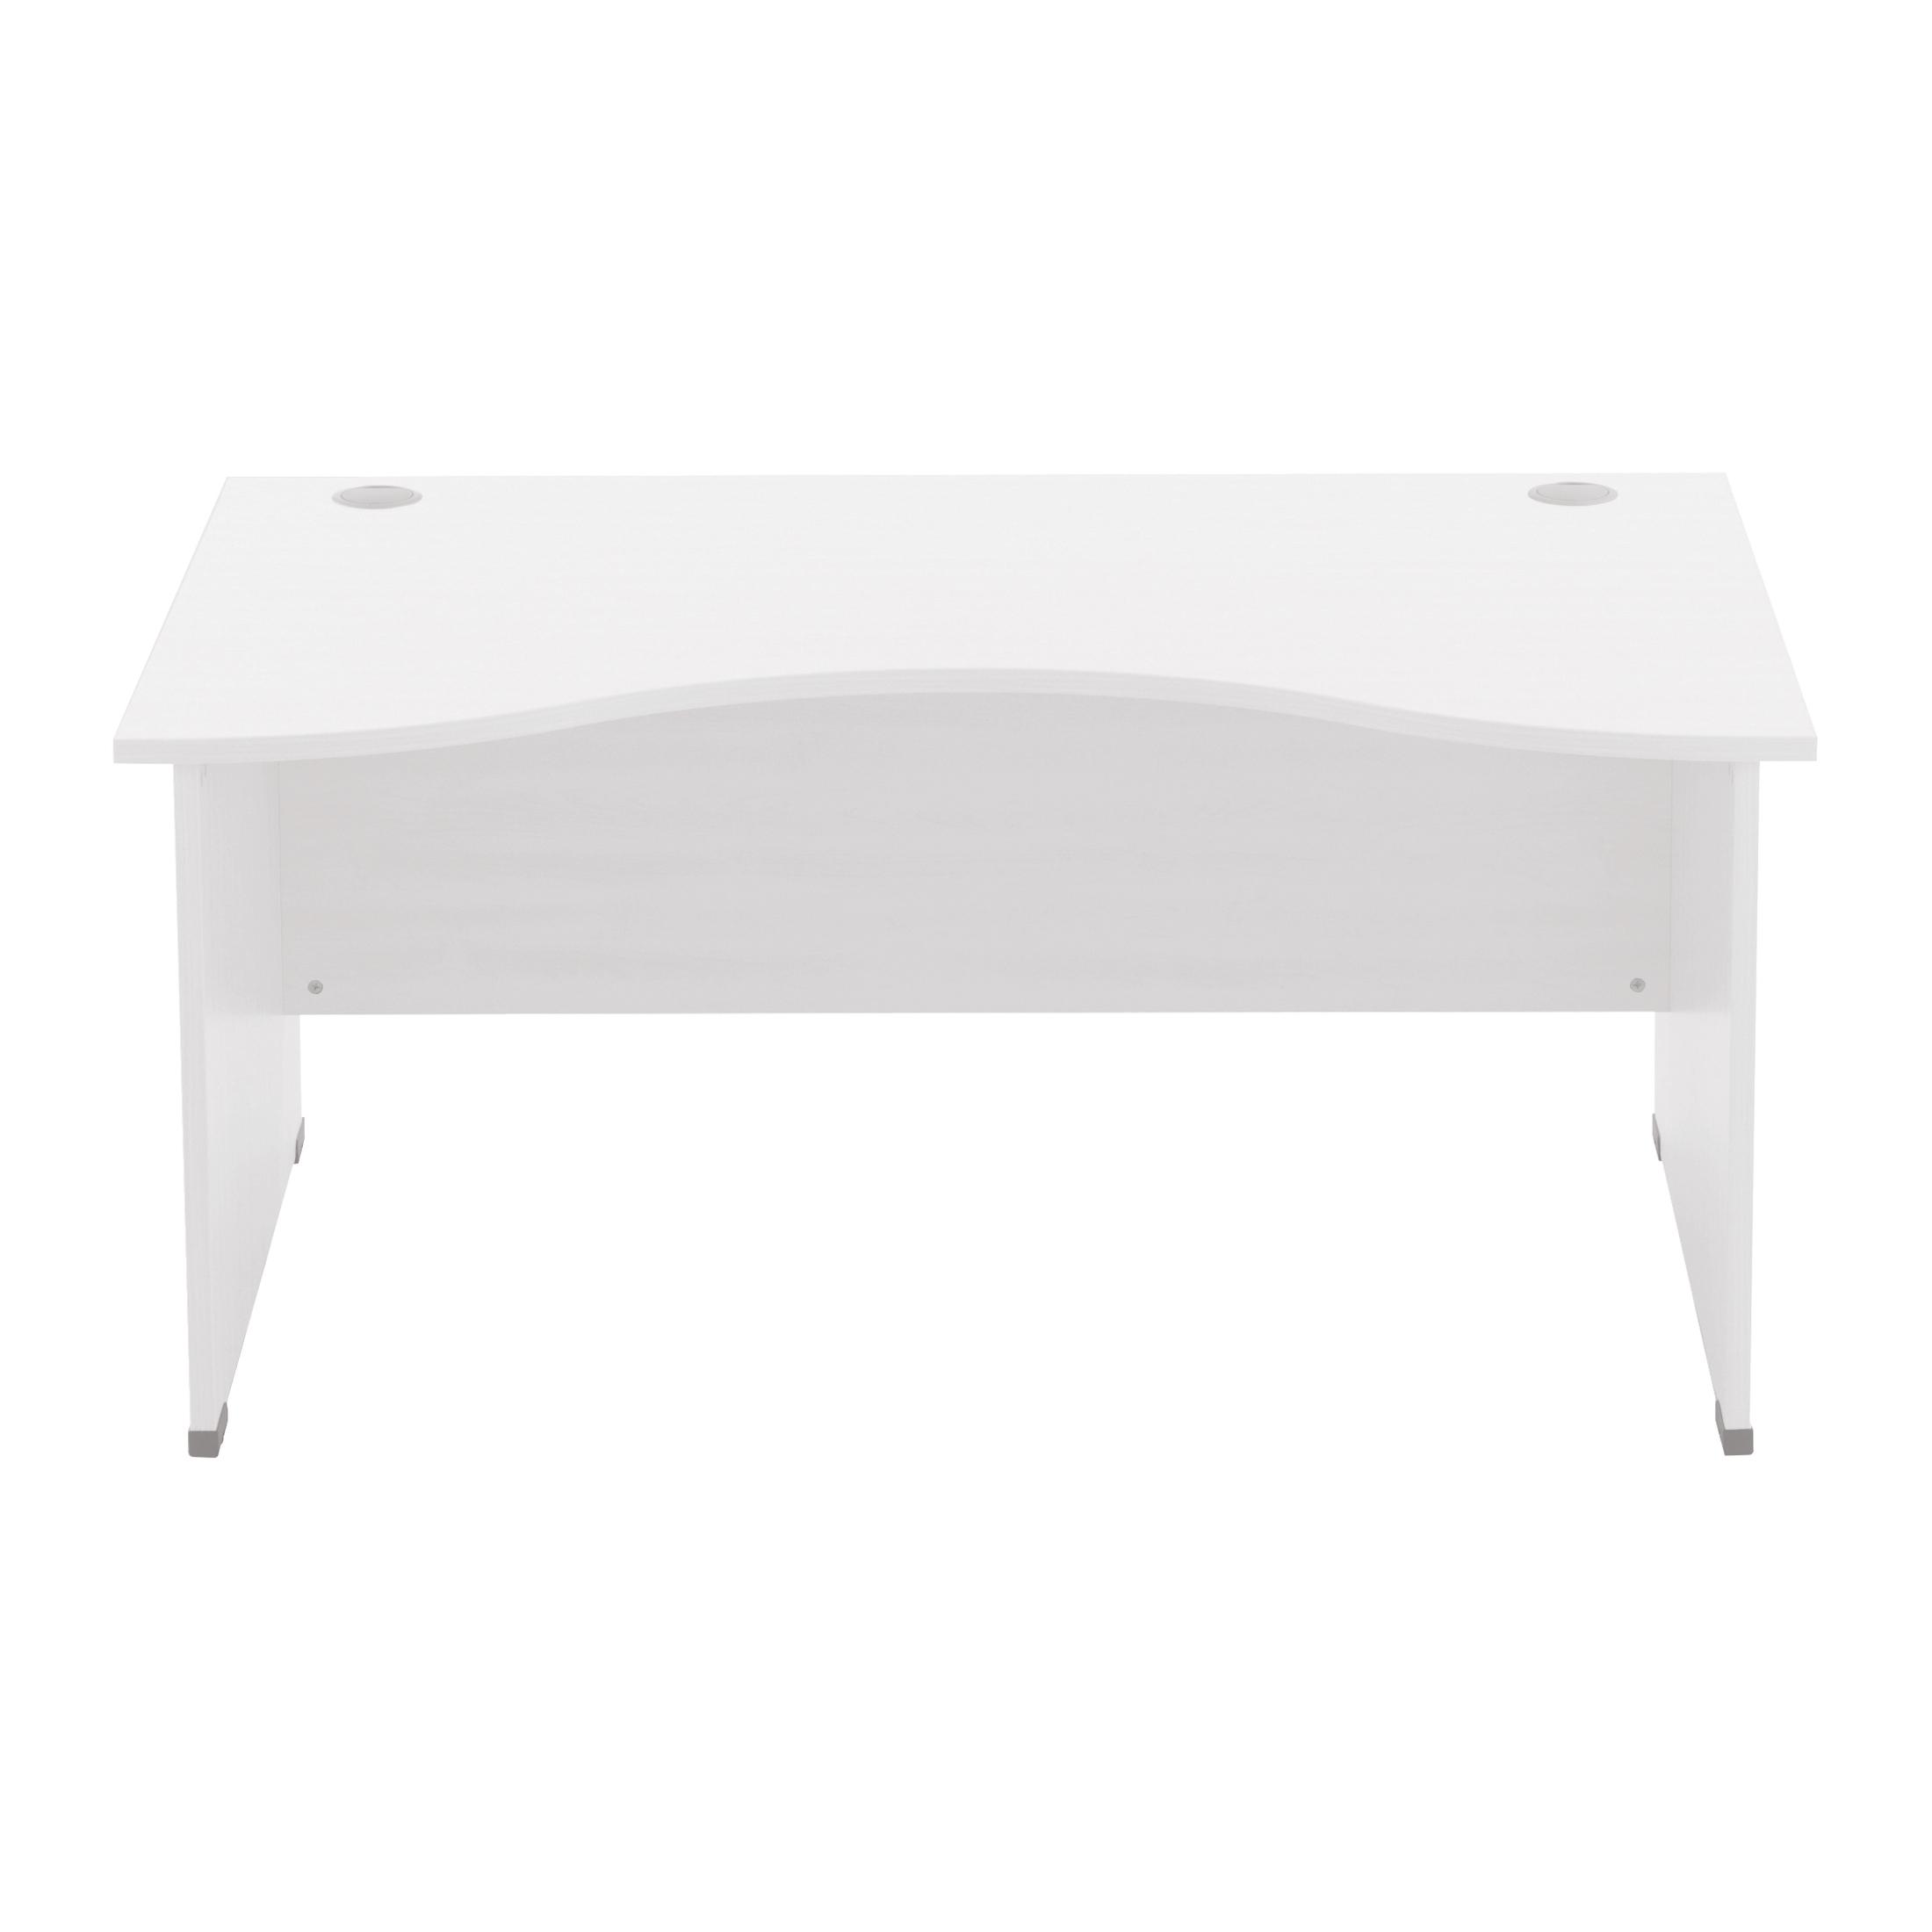 Sonix Double Wave Desk Panel End Legs 1600/1000mm Polar White Ref W9409wh